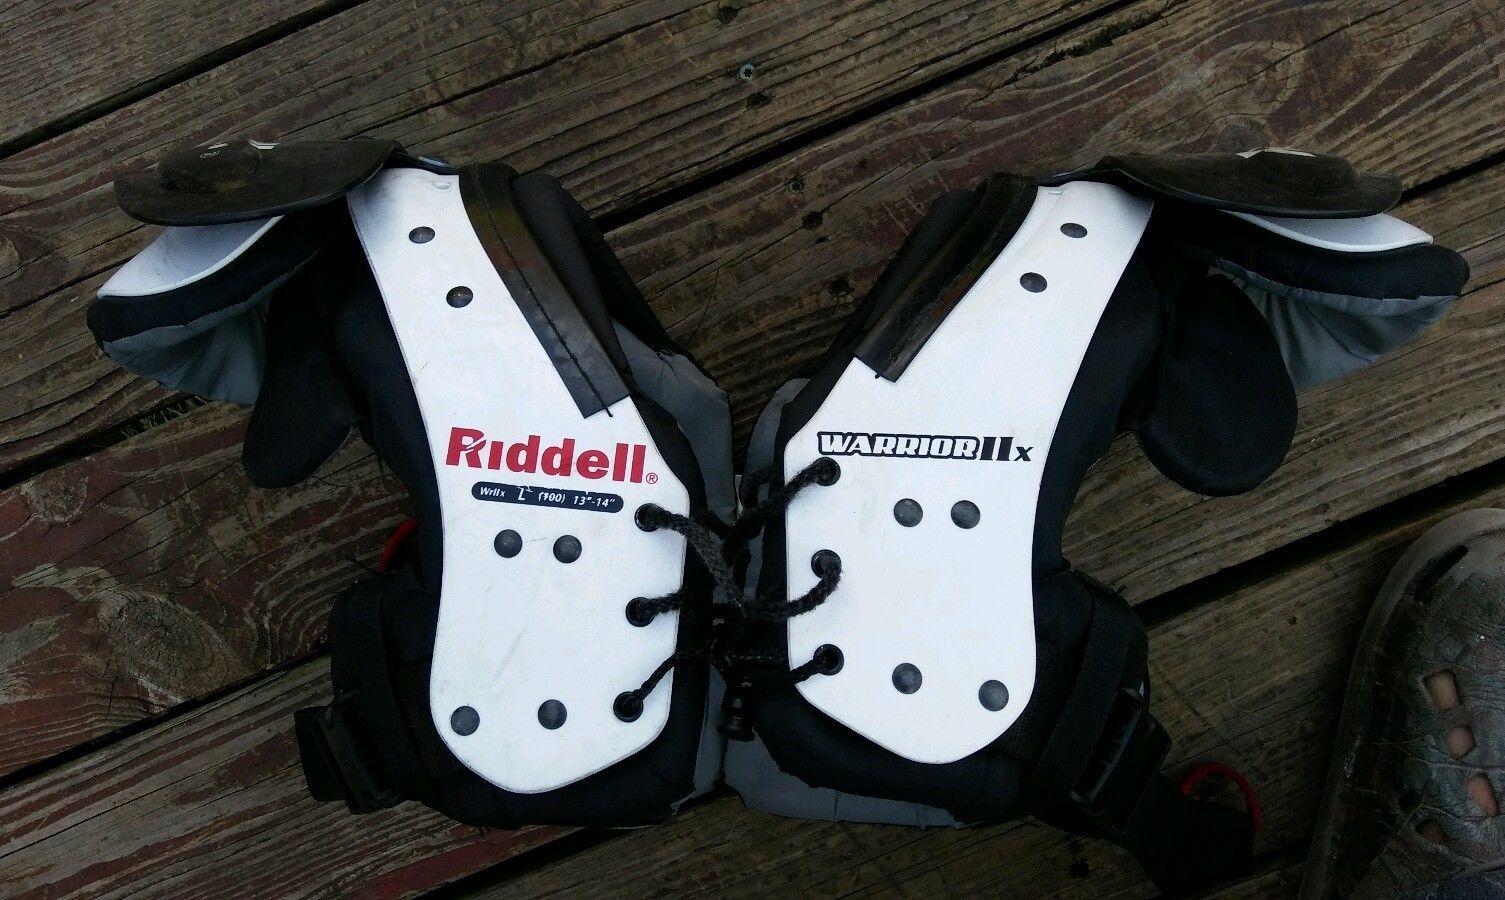 Riddell warrior iix black white youth football shoulder